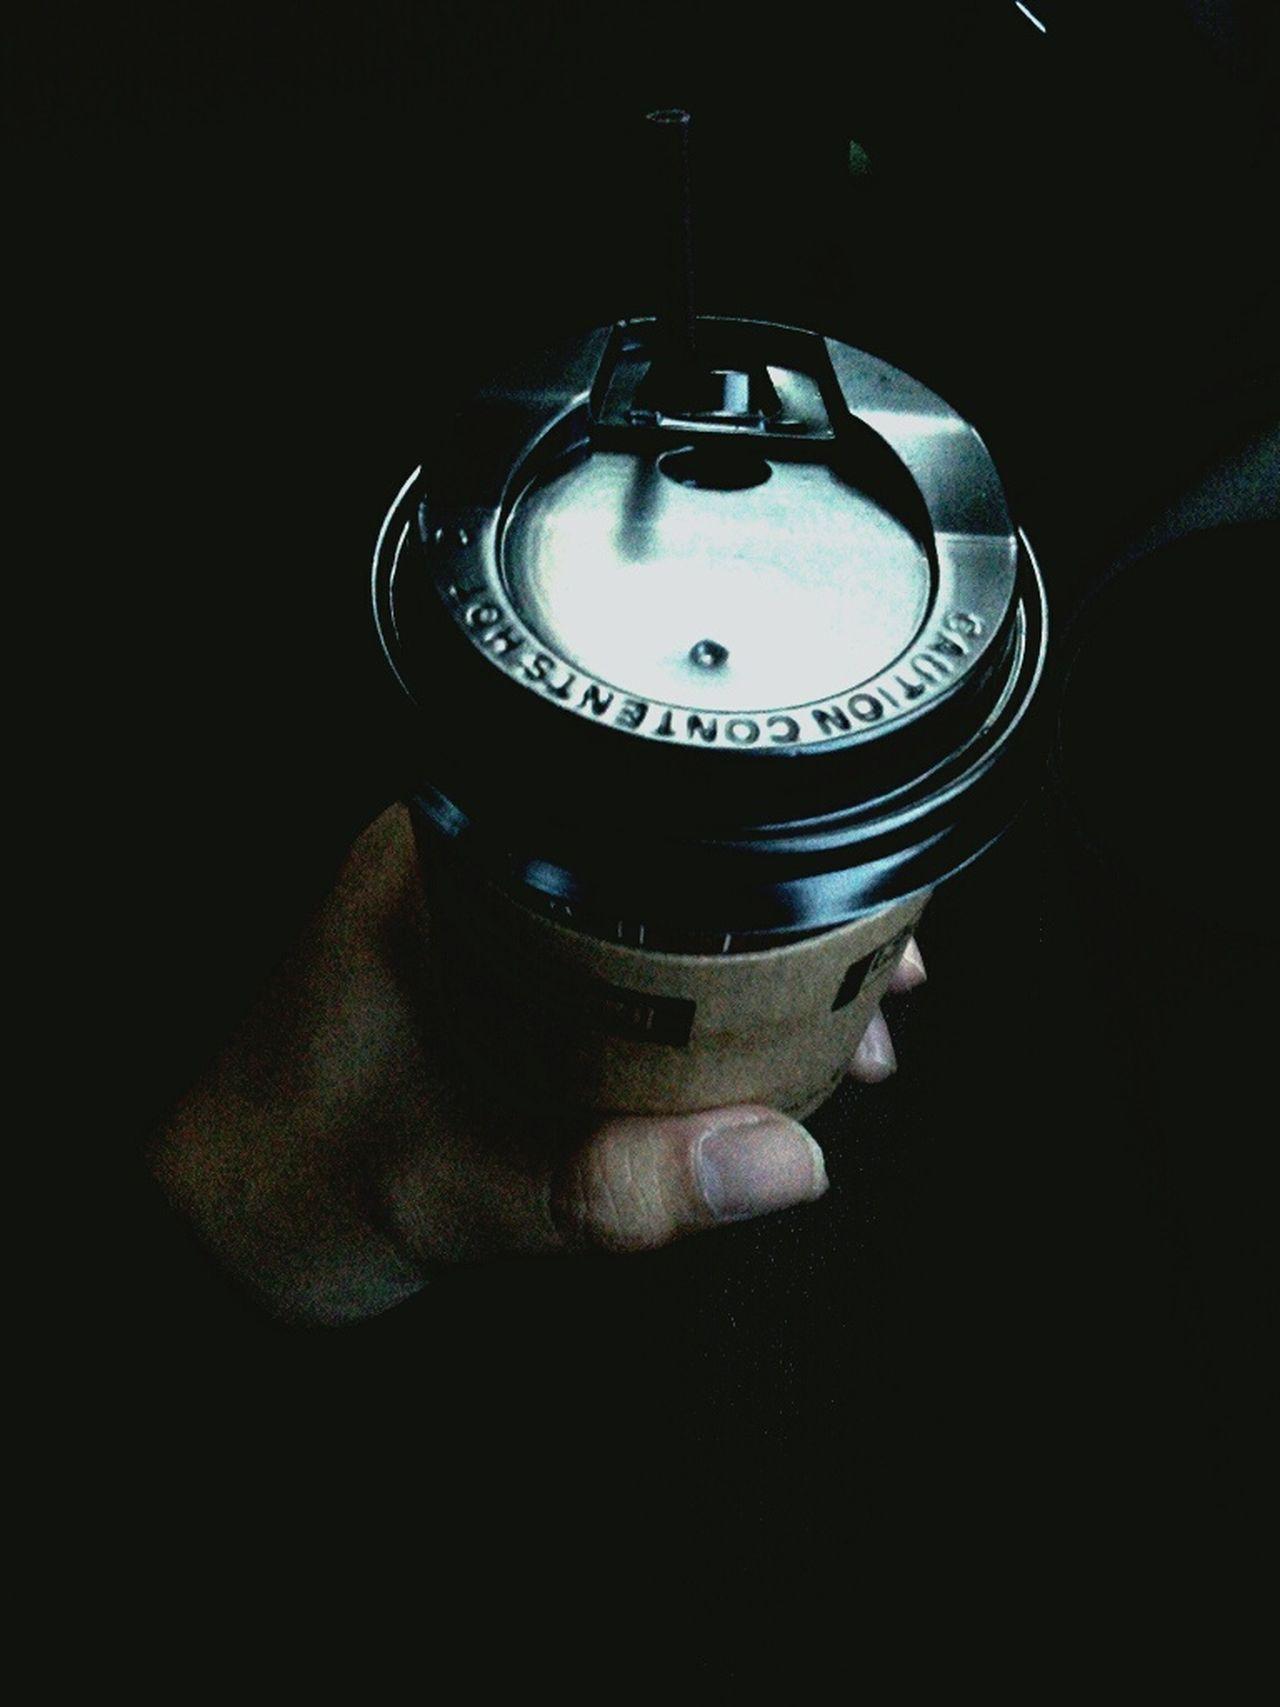 Coffee Lifestyles Close-up Black Background People Human Hand First Eyeem Photo